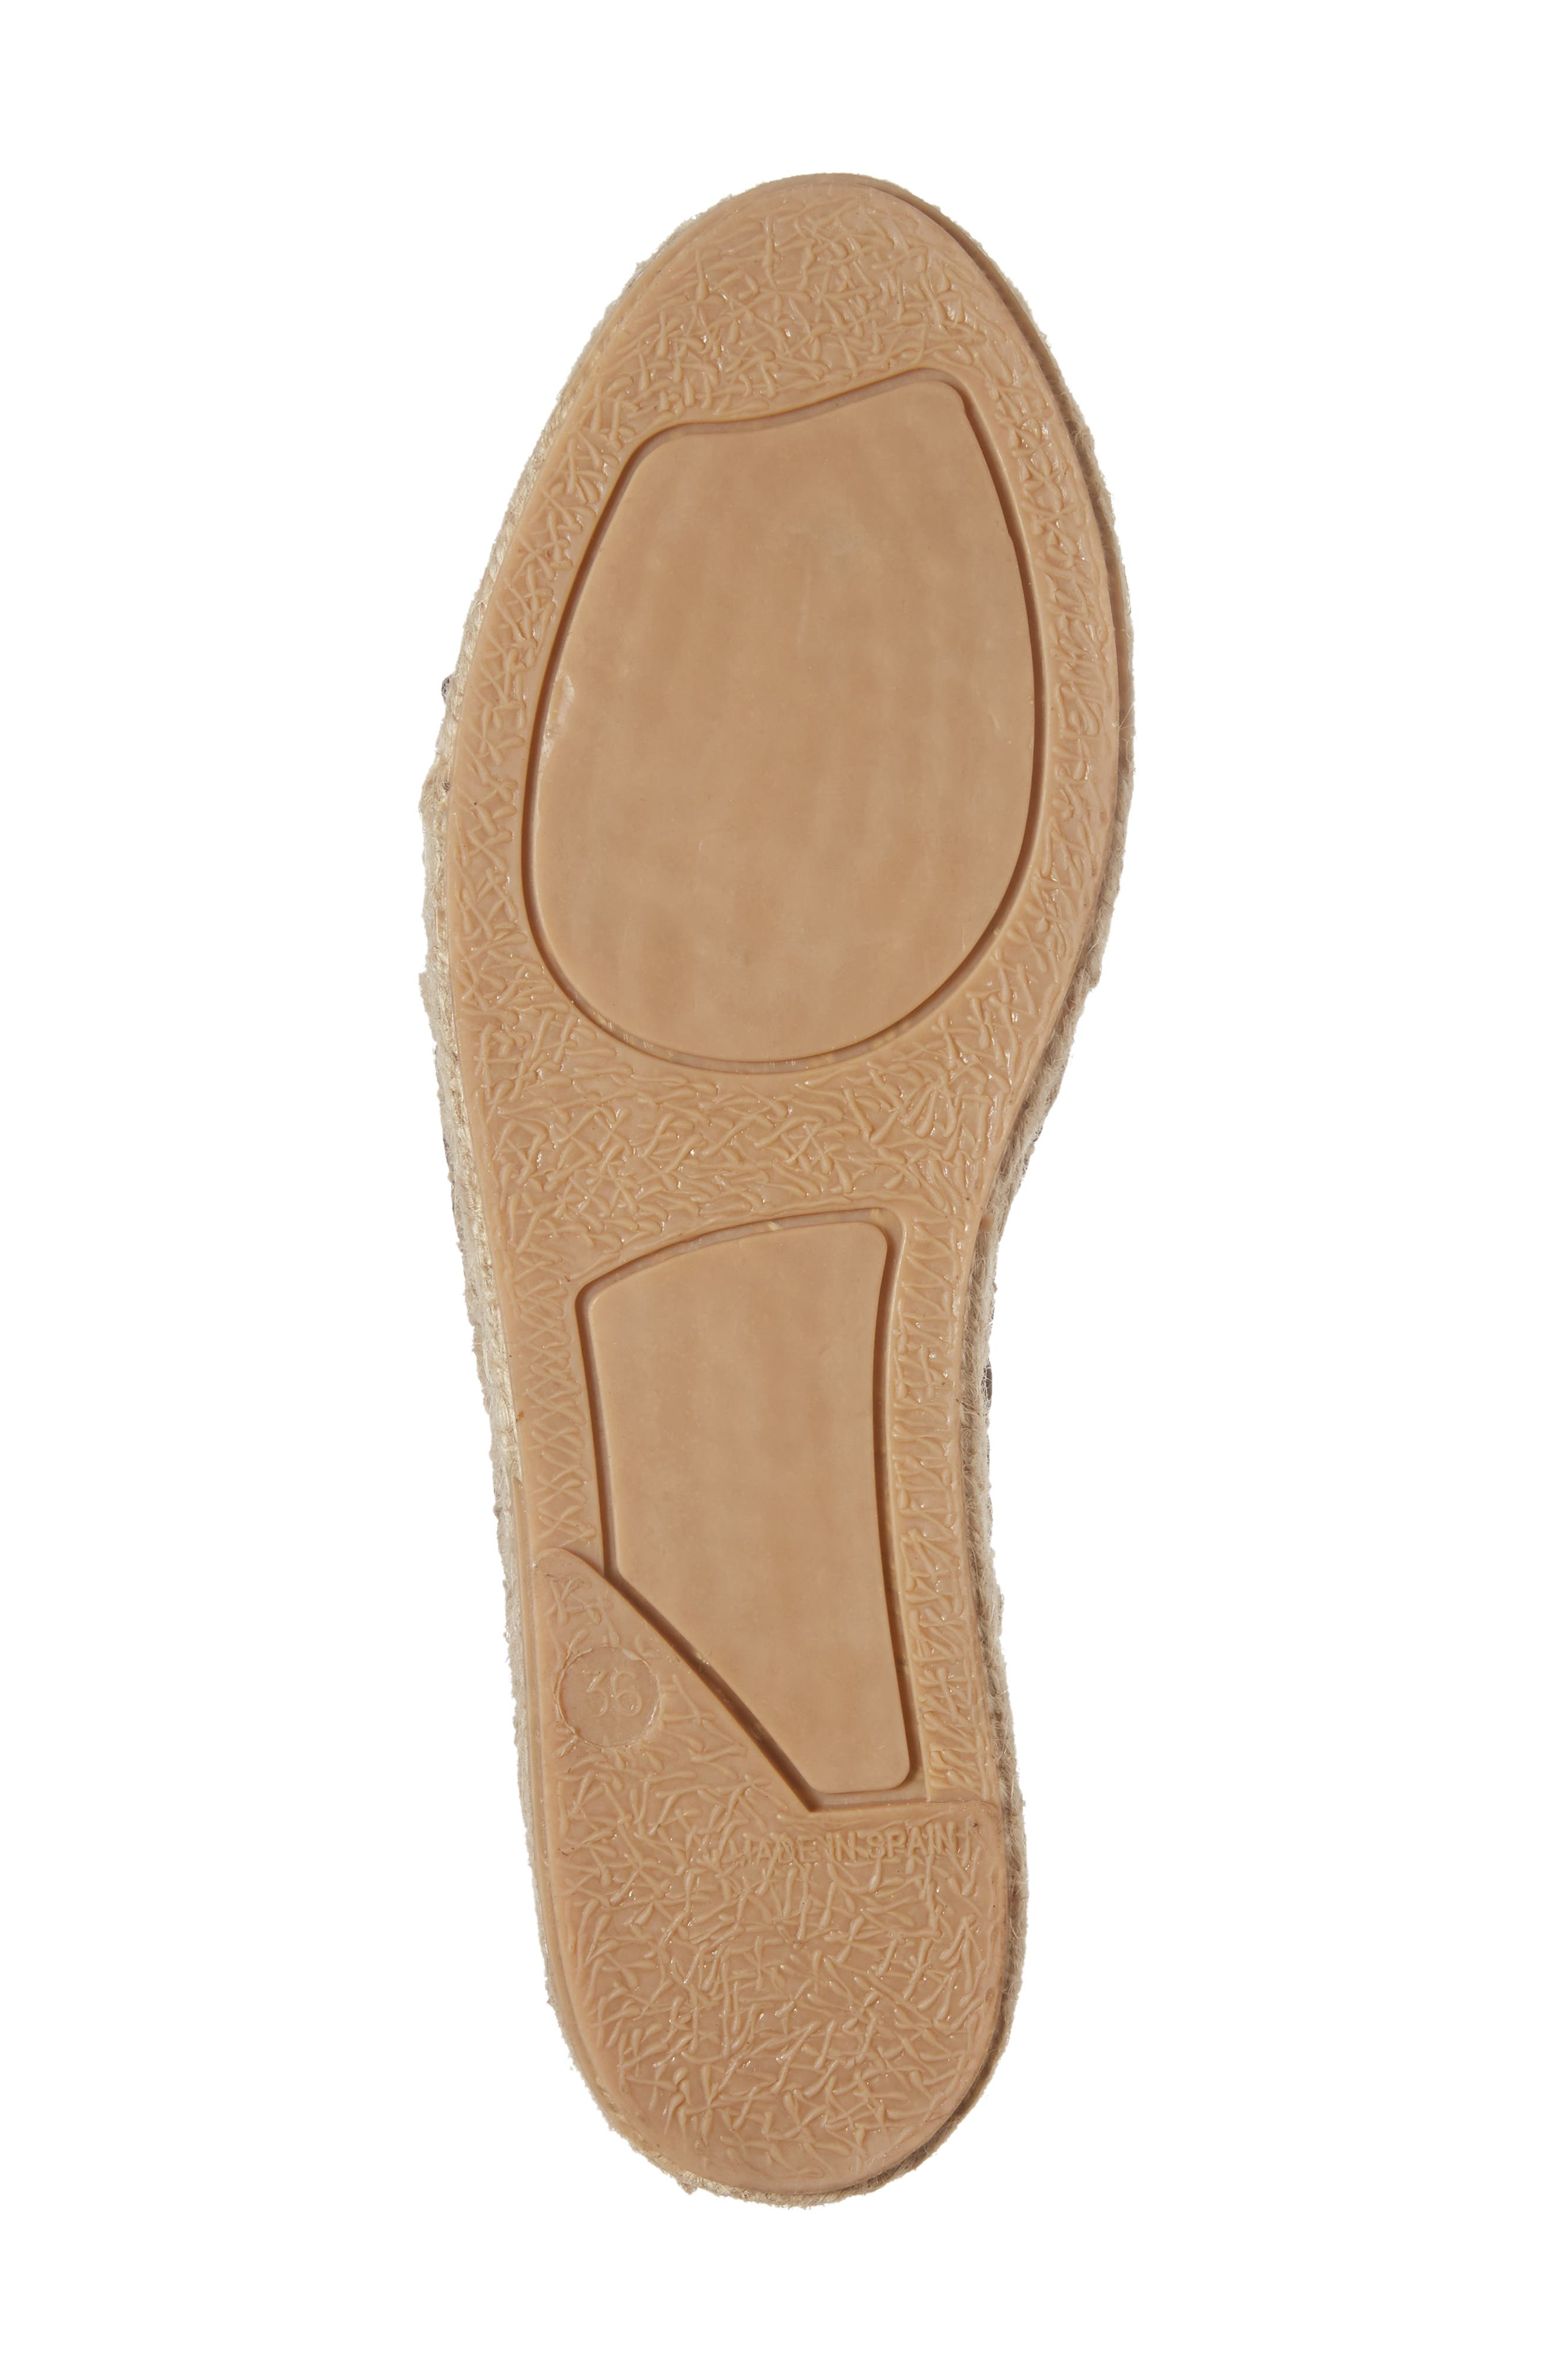 Krown Wraparound Platform Sandal,                             Alternate thumbnail 11, color,